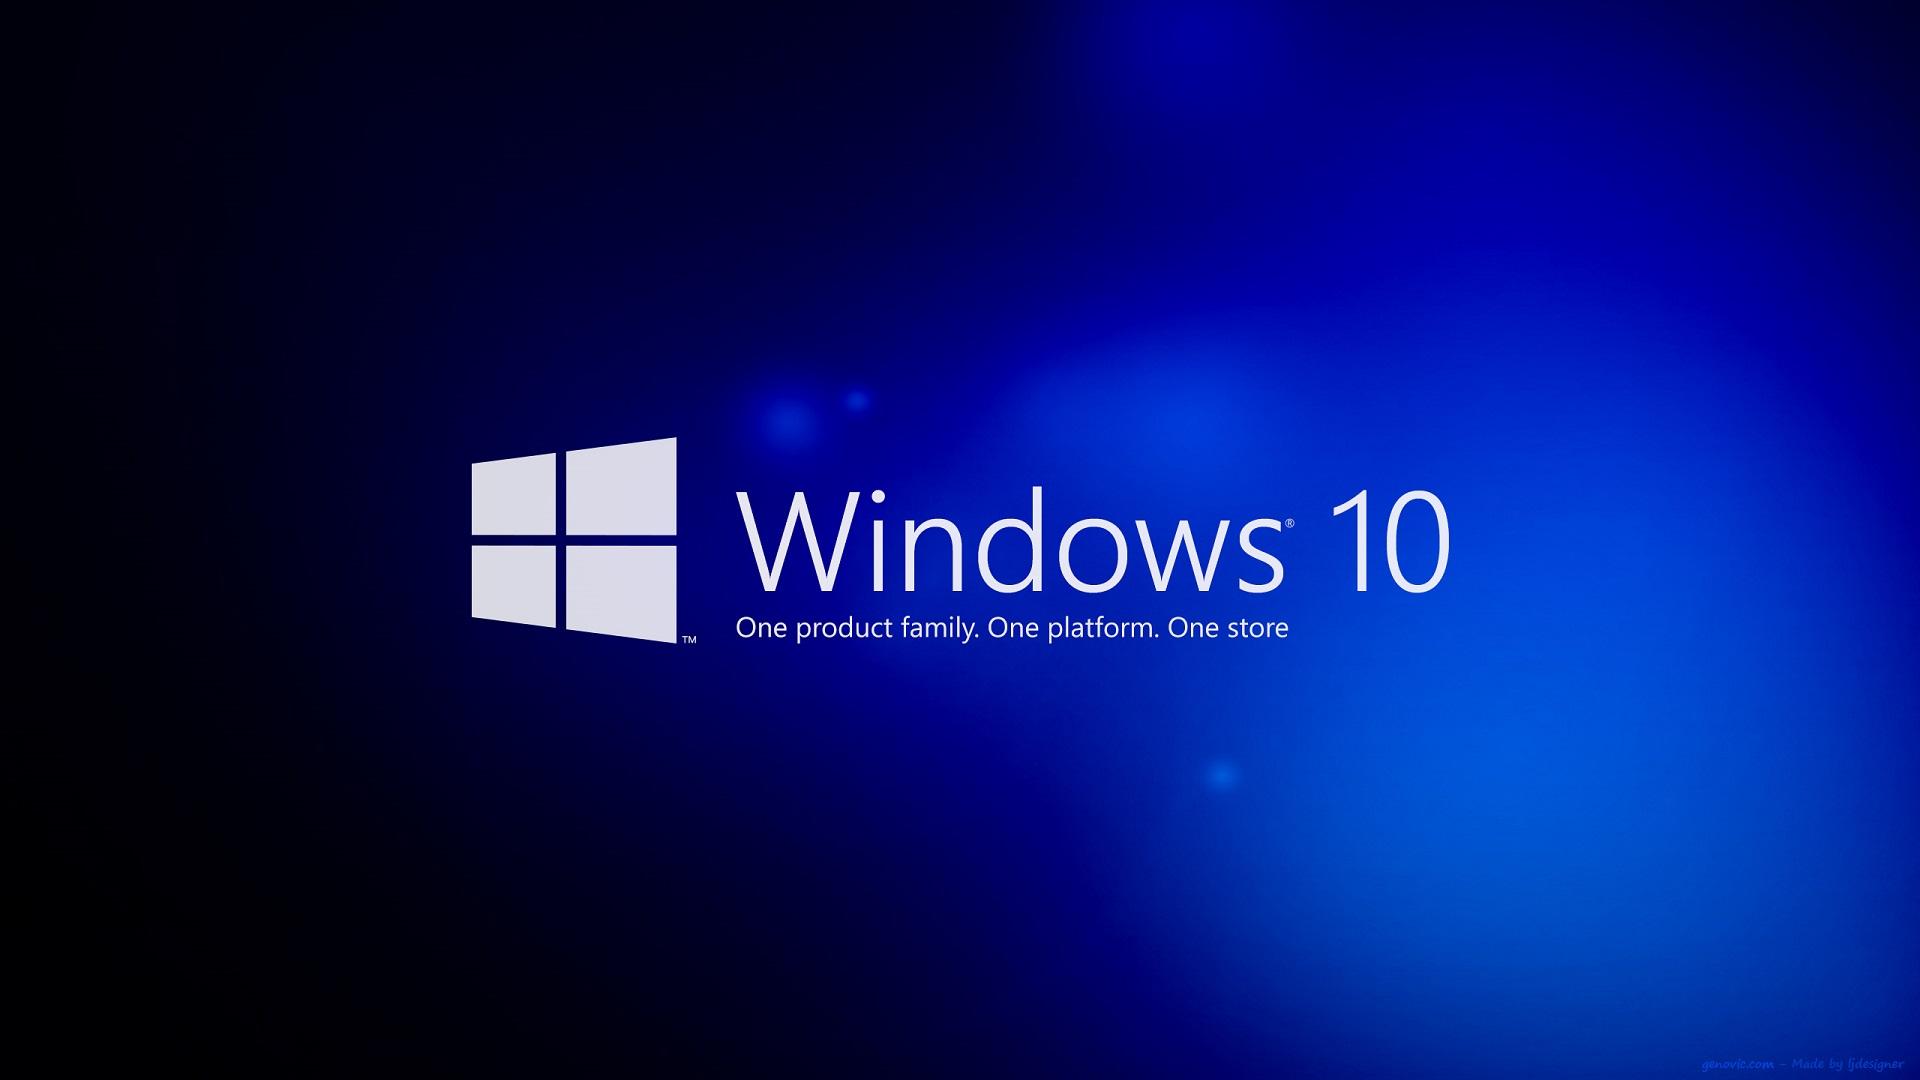 Windows 10 HD Wallpaper 1920x1080 - WallpaperSafari